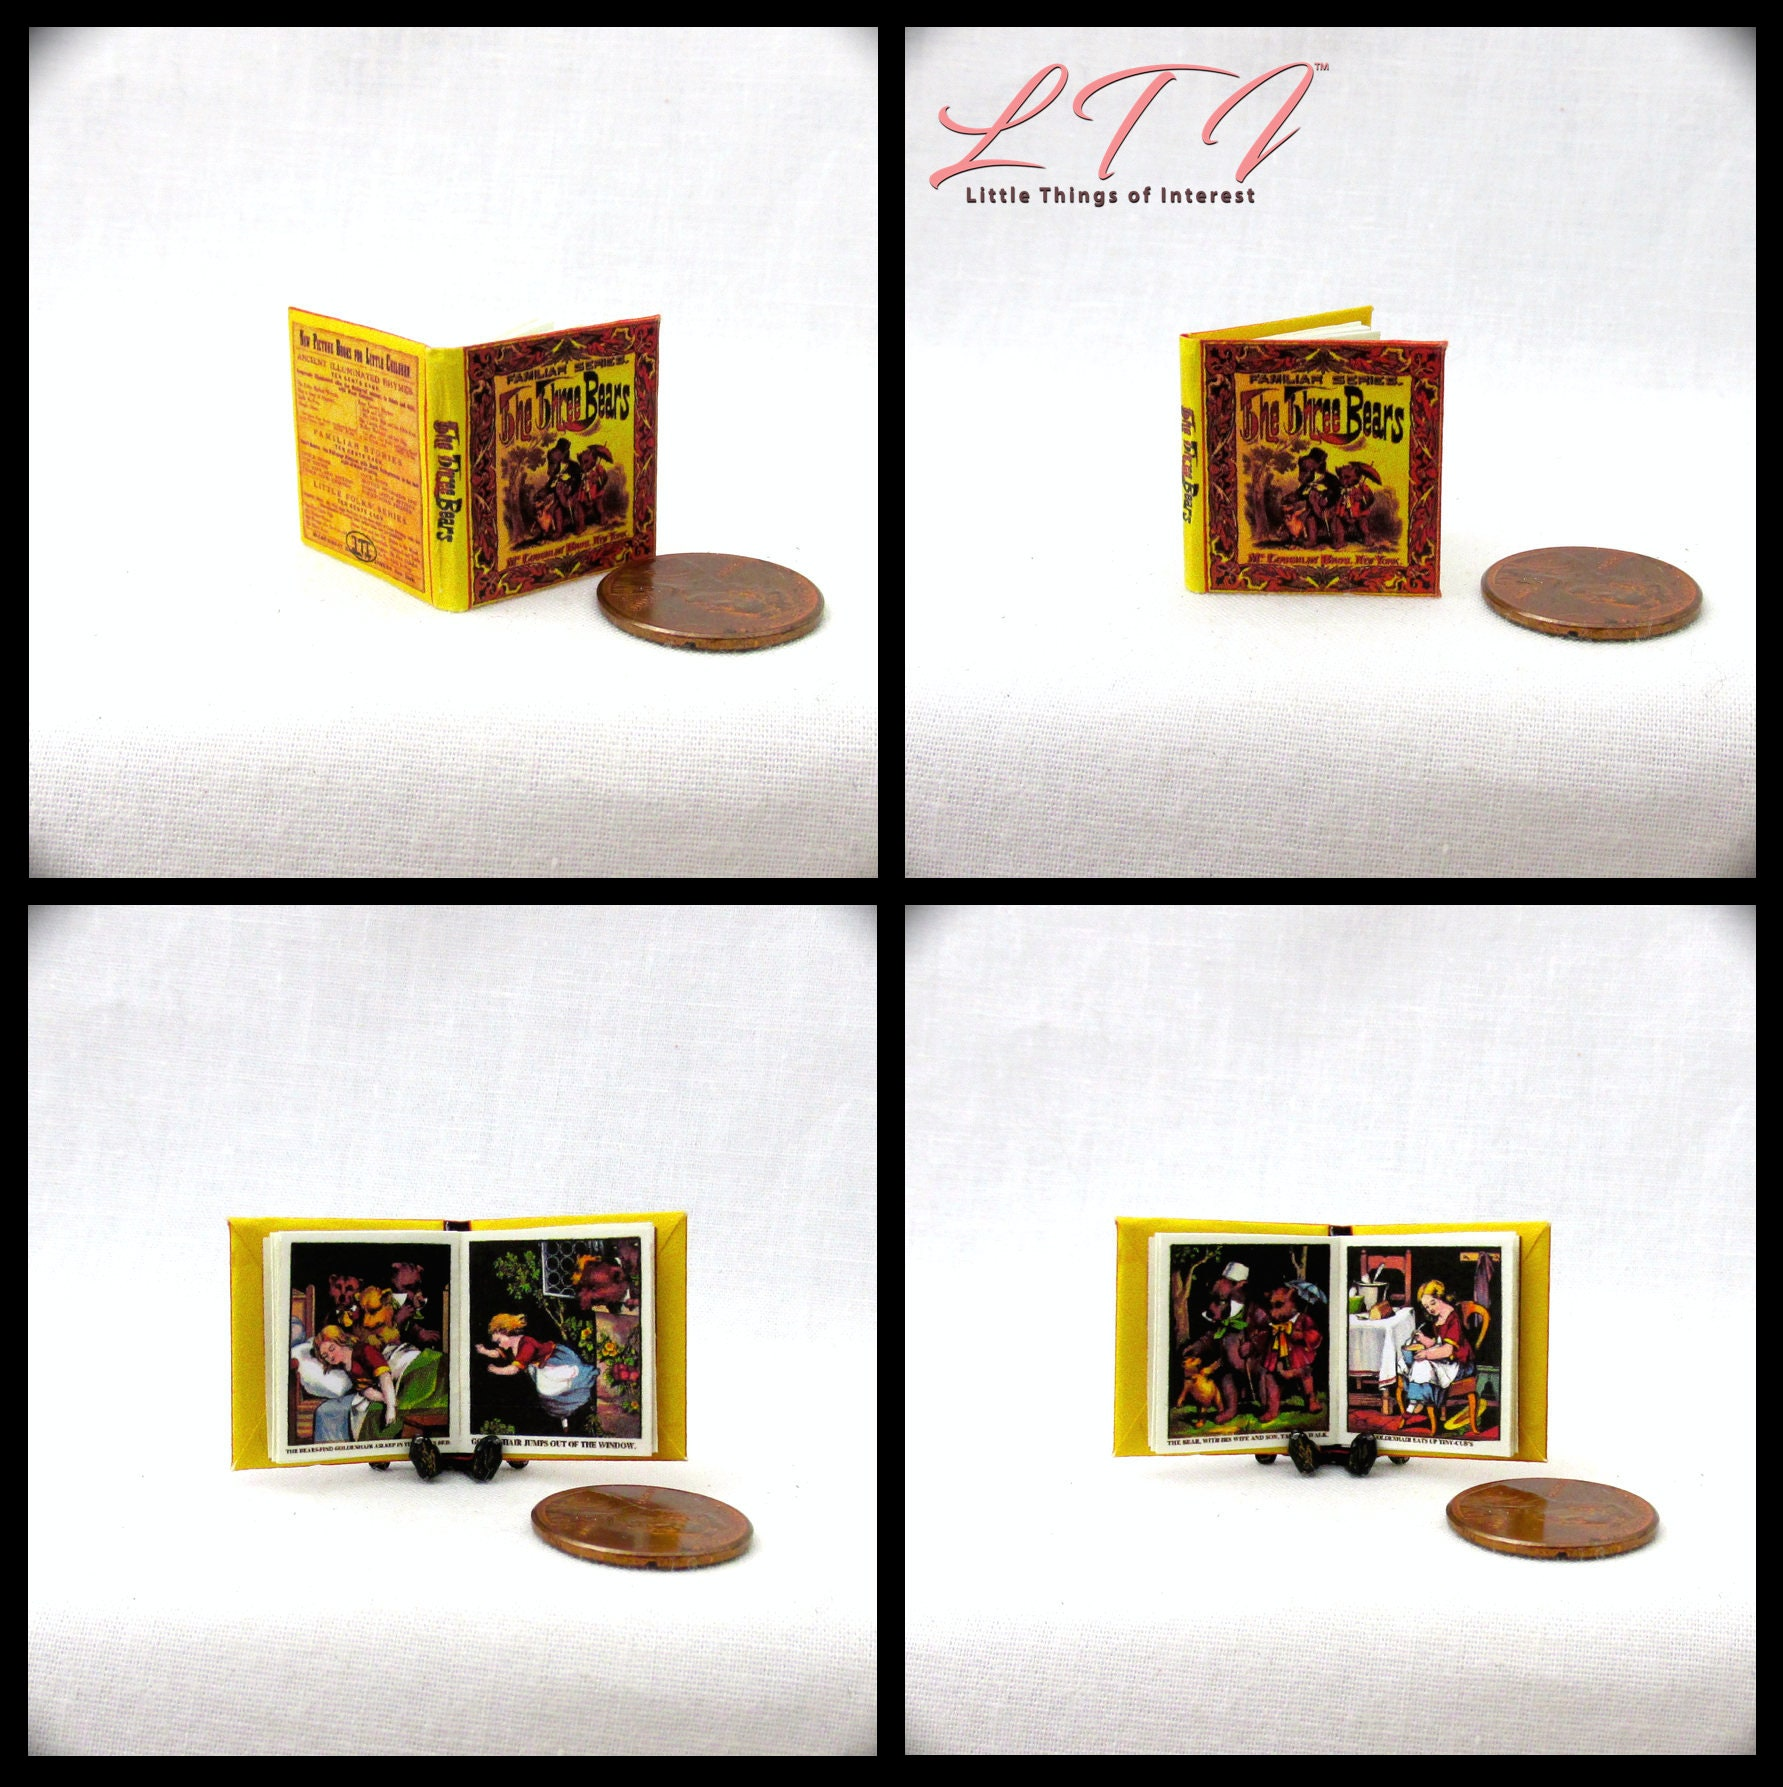 Goldilocks and the Three Bears dollhouse miniature book